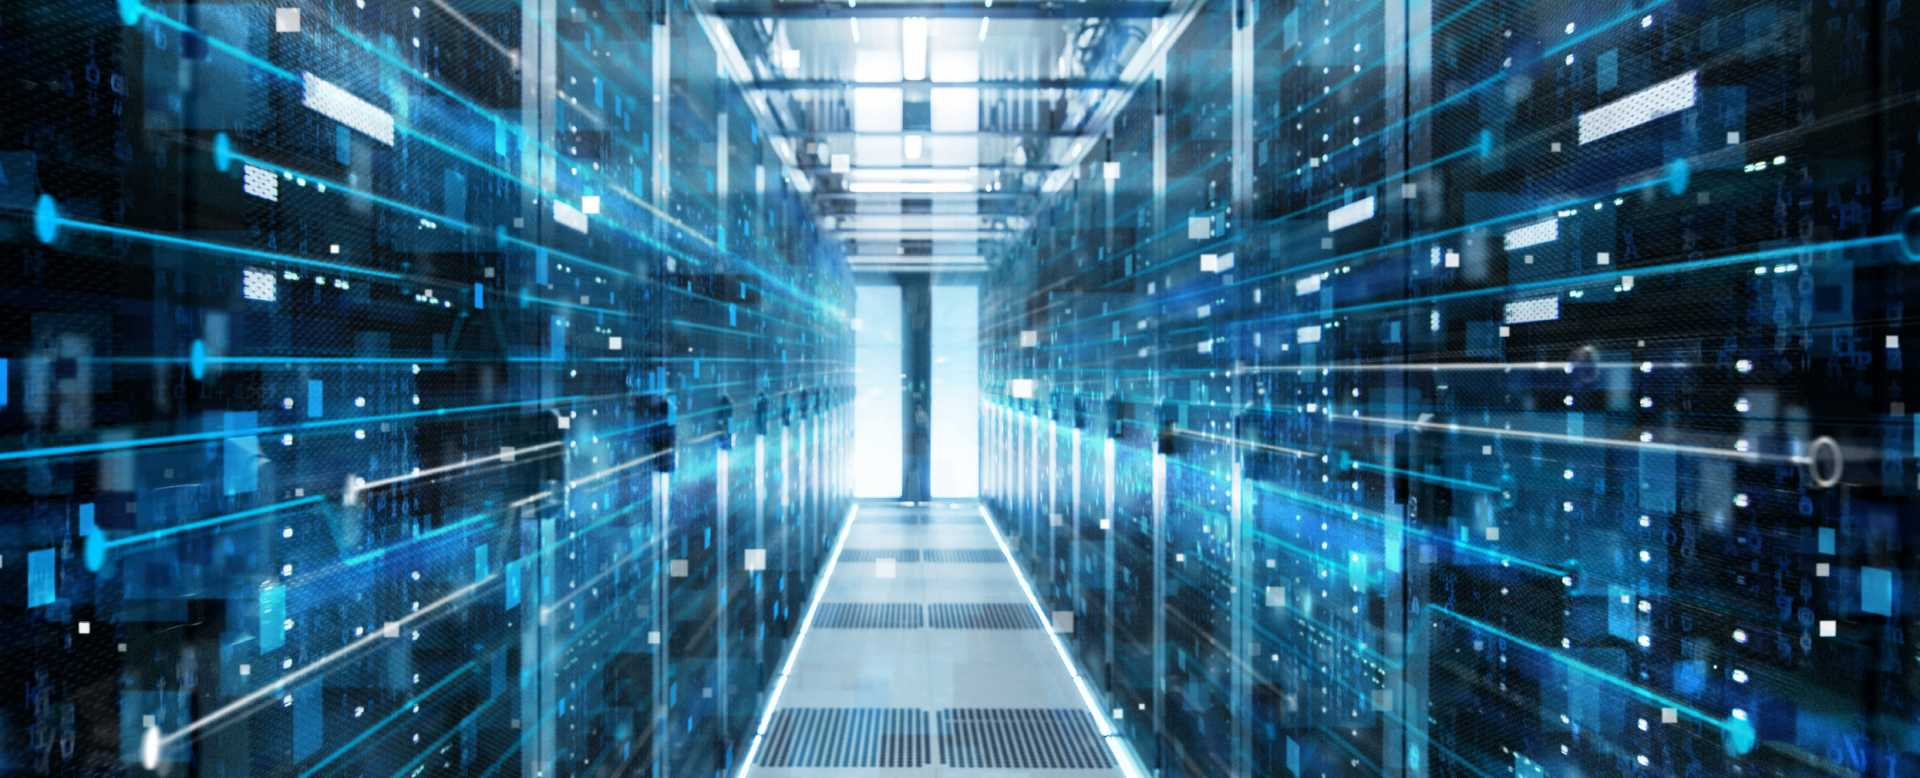 CROP - Server Room IT Digital Technology - stock image